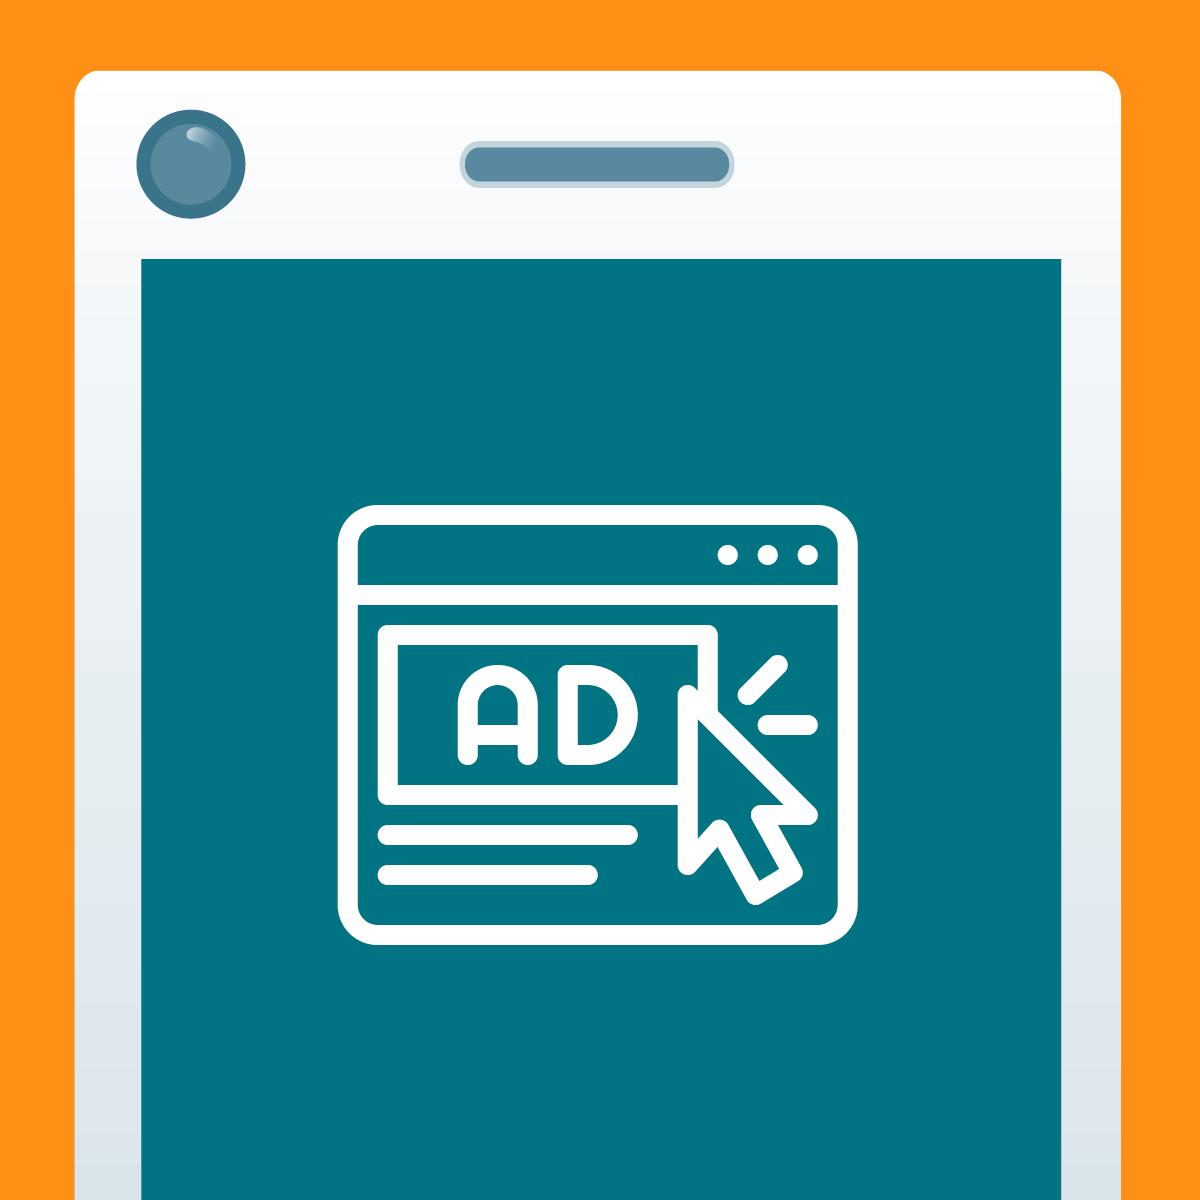 Online/Digital Marketing - Online Advertising